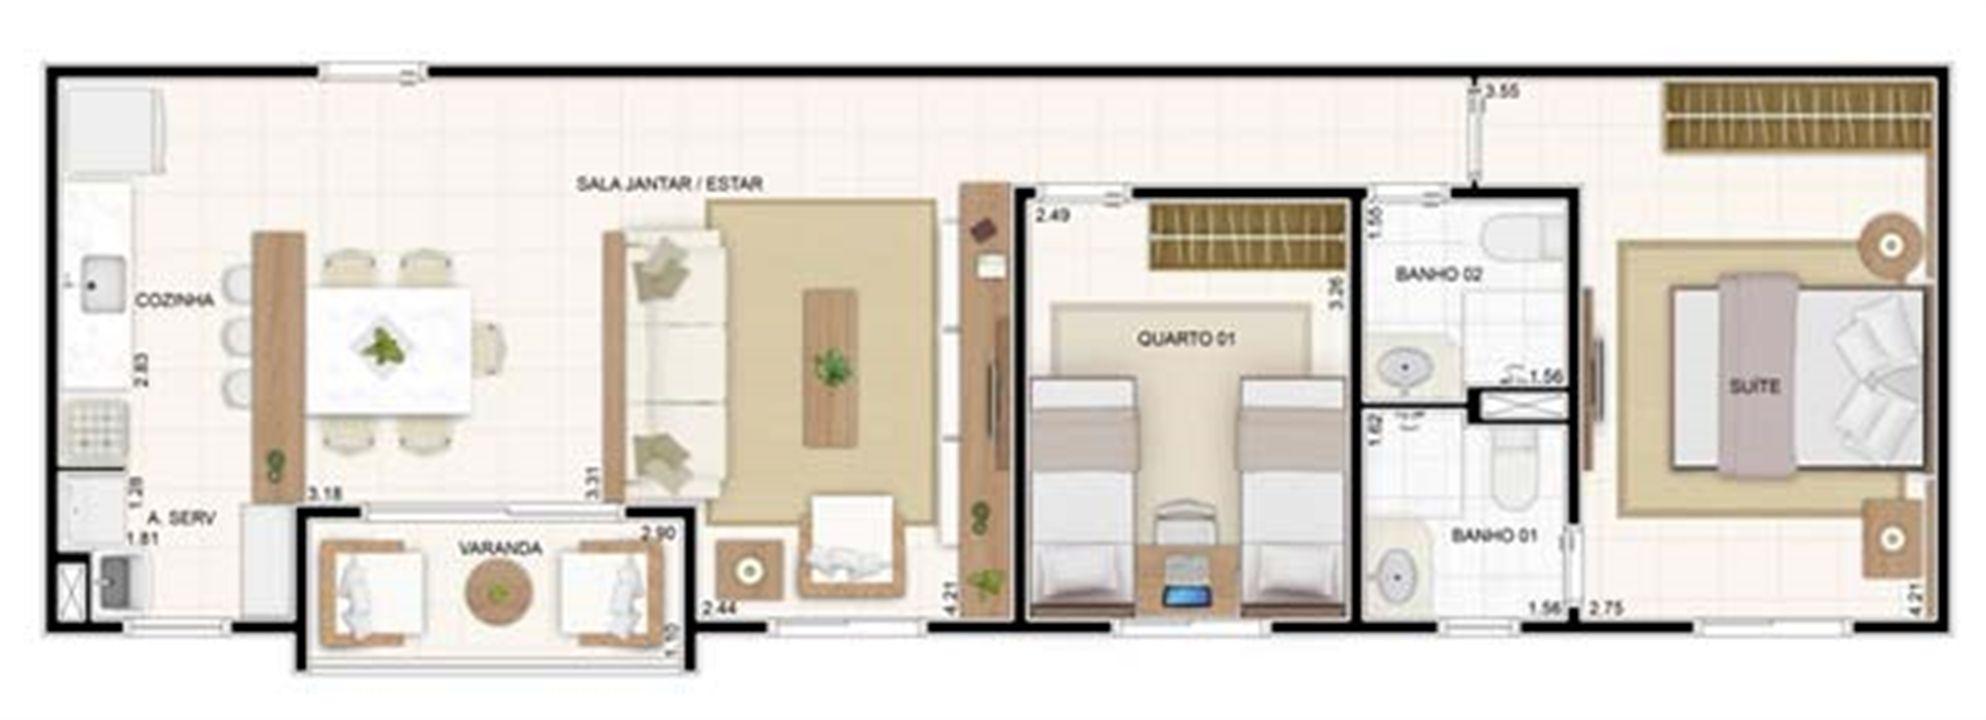 3 dorms Sala Ampliada 67,35m²   Vita 2 Residencial Clube – Apartamentono  Pitimbu - Natal - Rio Grande do Norte